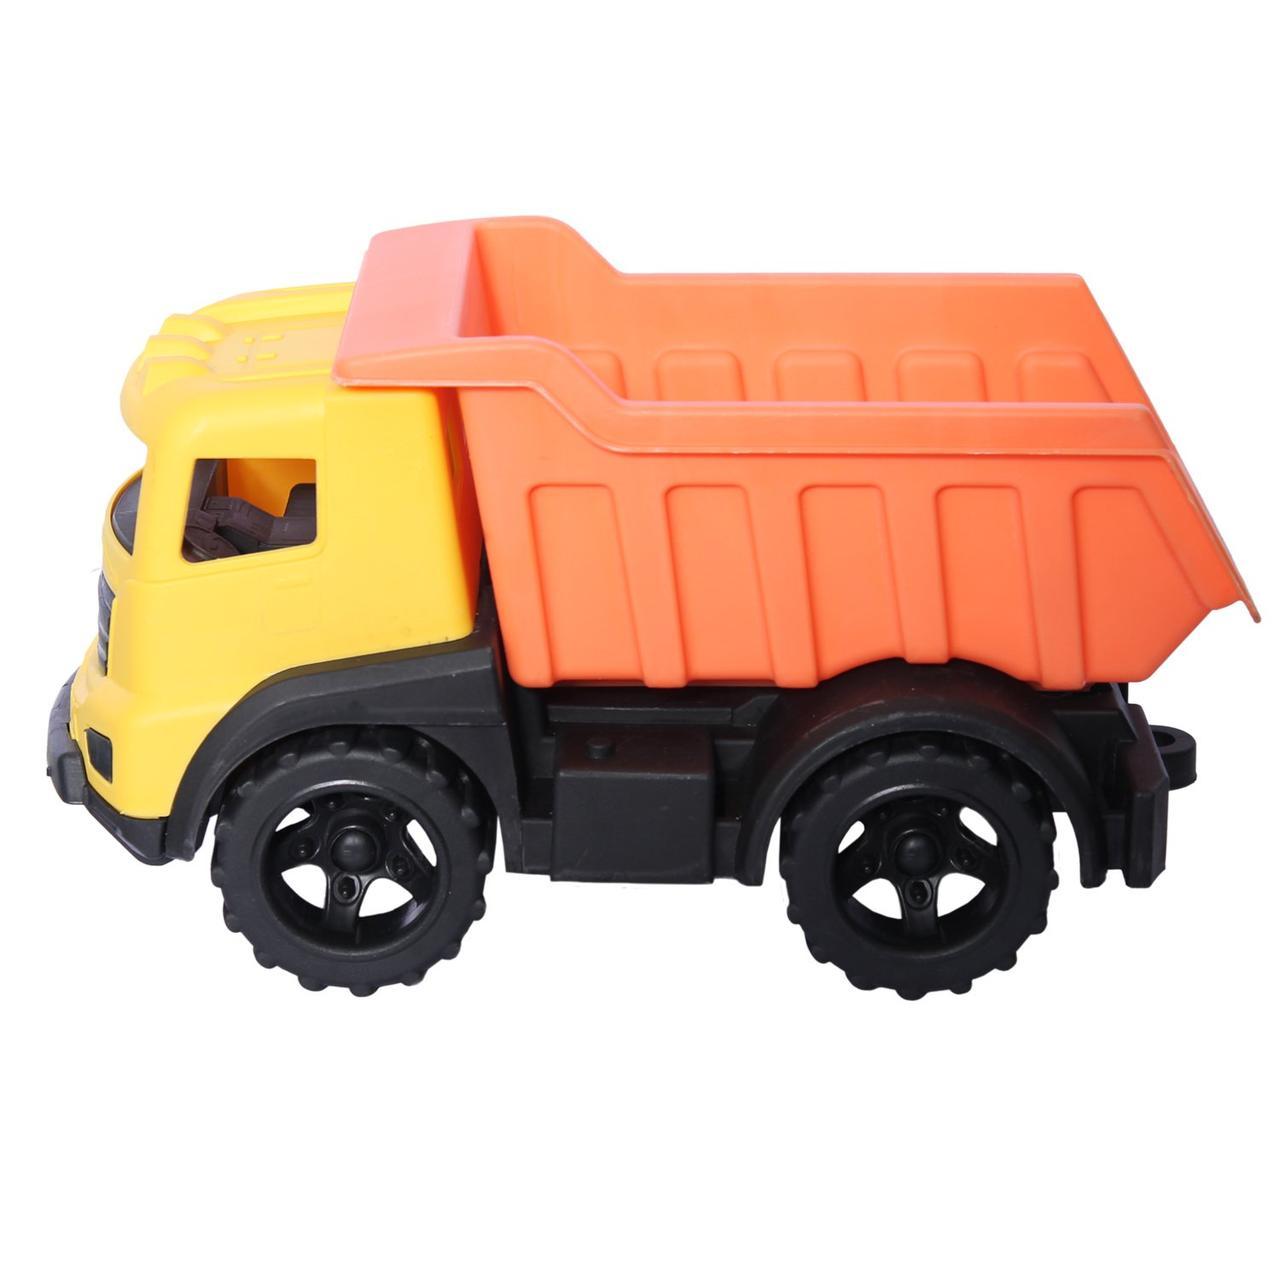 "Грузовик ""Казик"" (желтый + оранжевый) в коробке 25 см"